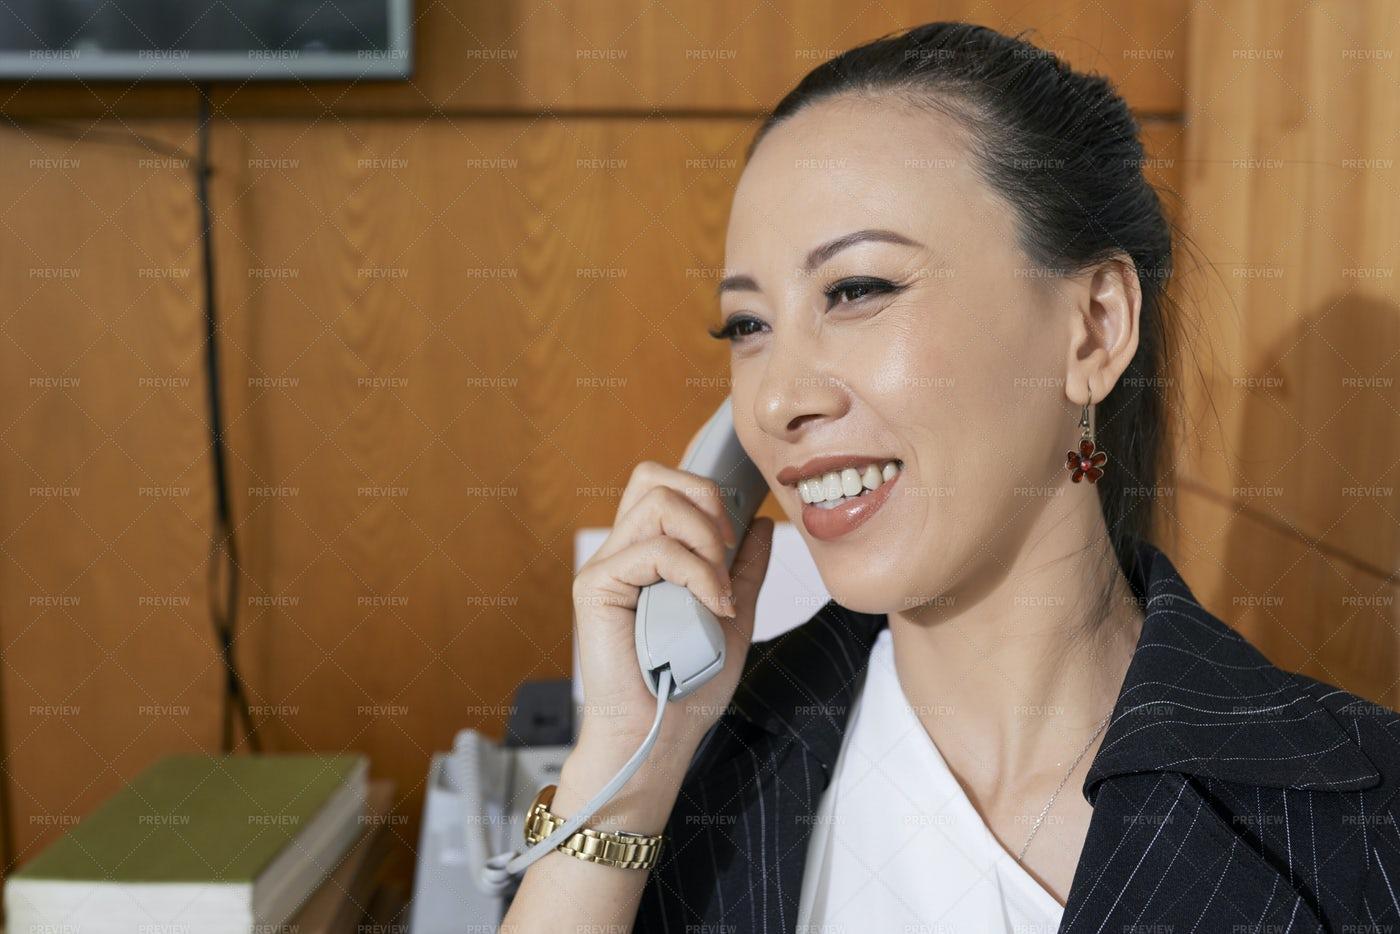 Businesswoman Has A Phone Call: Stock Photos